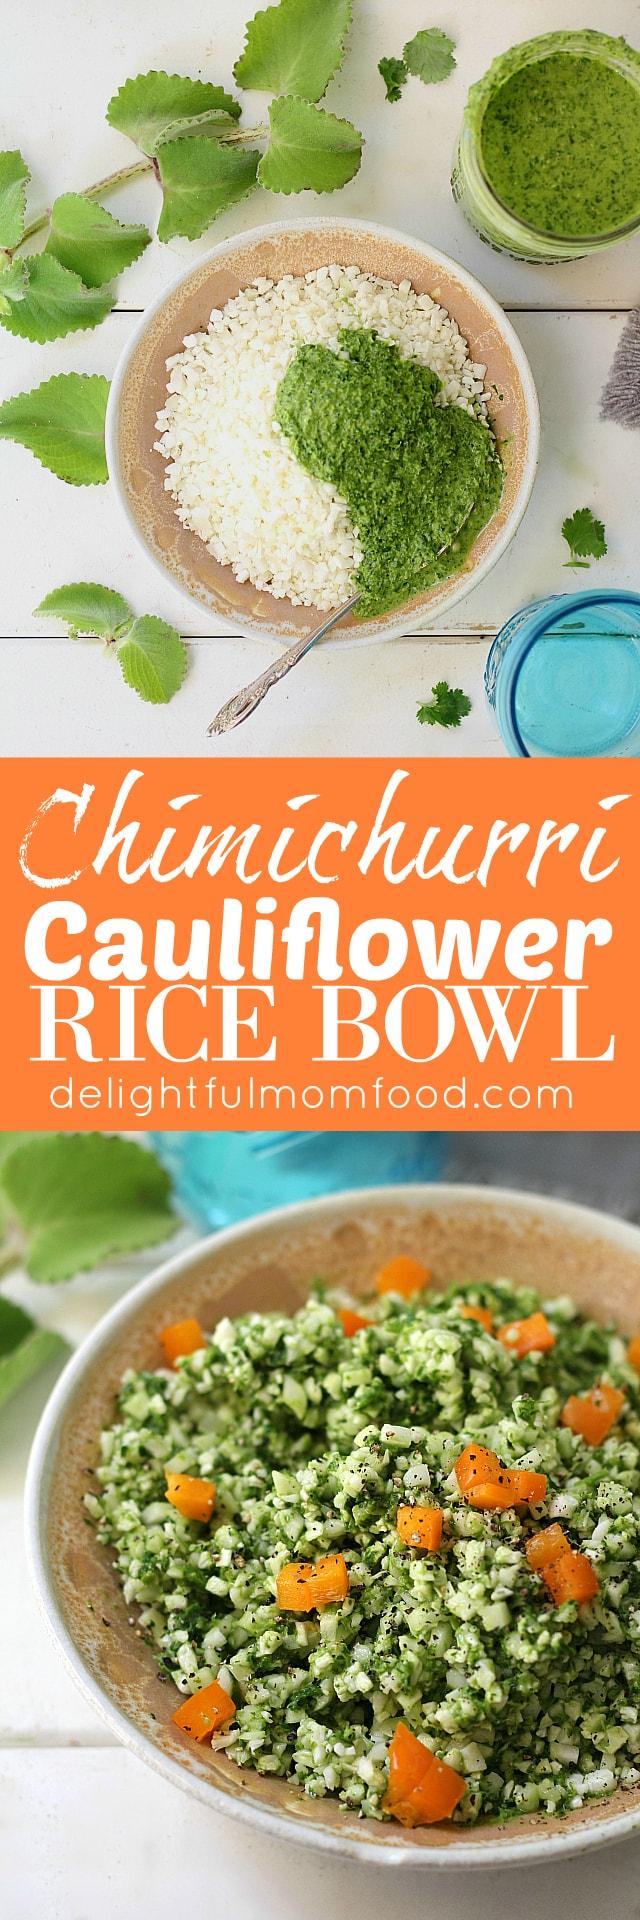 chimichurri cauliflower rice bowl